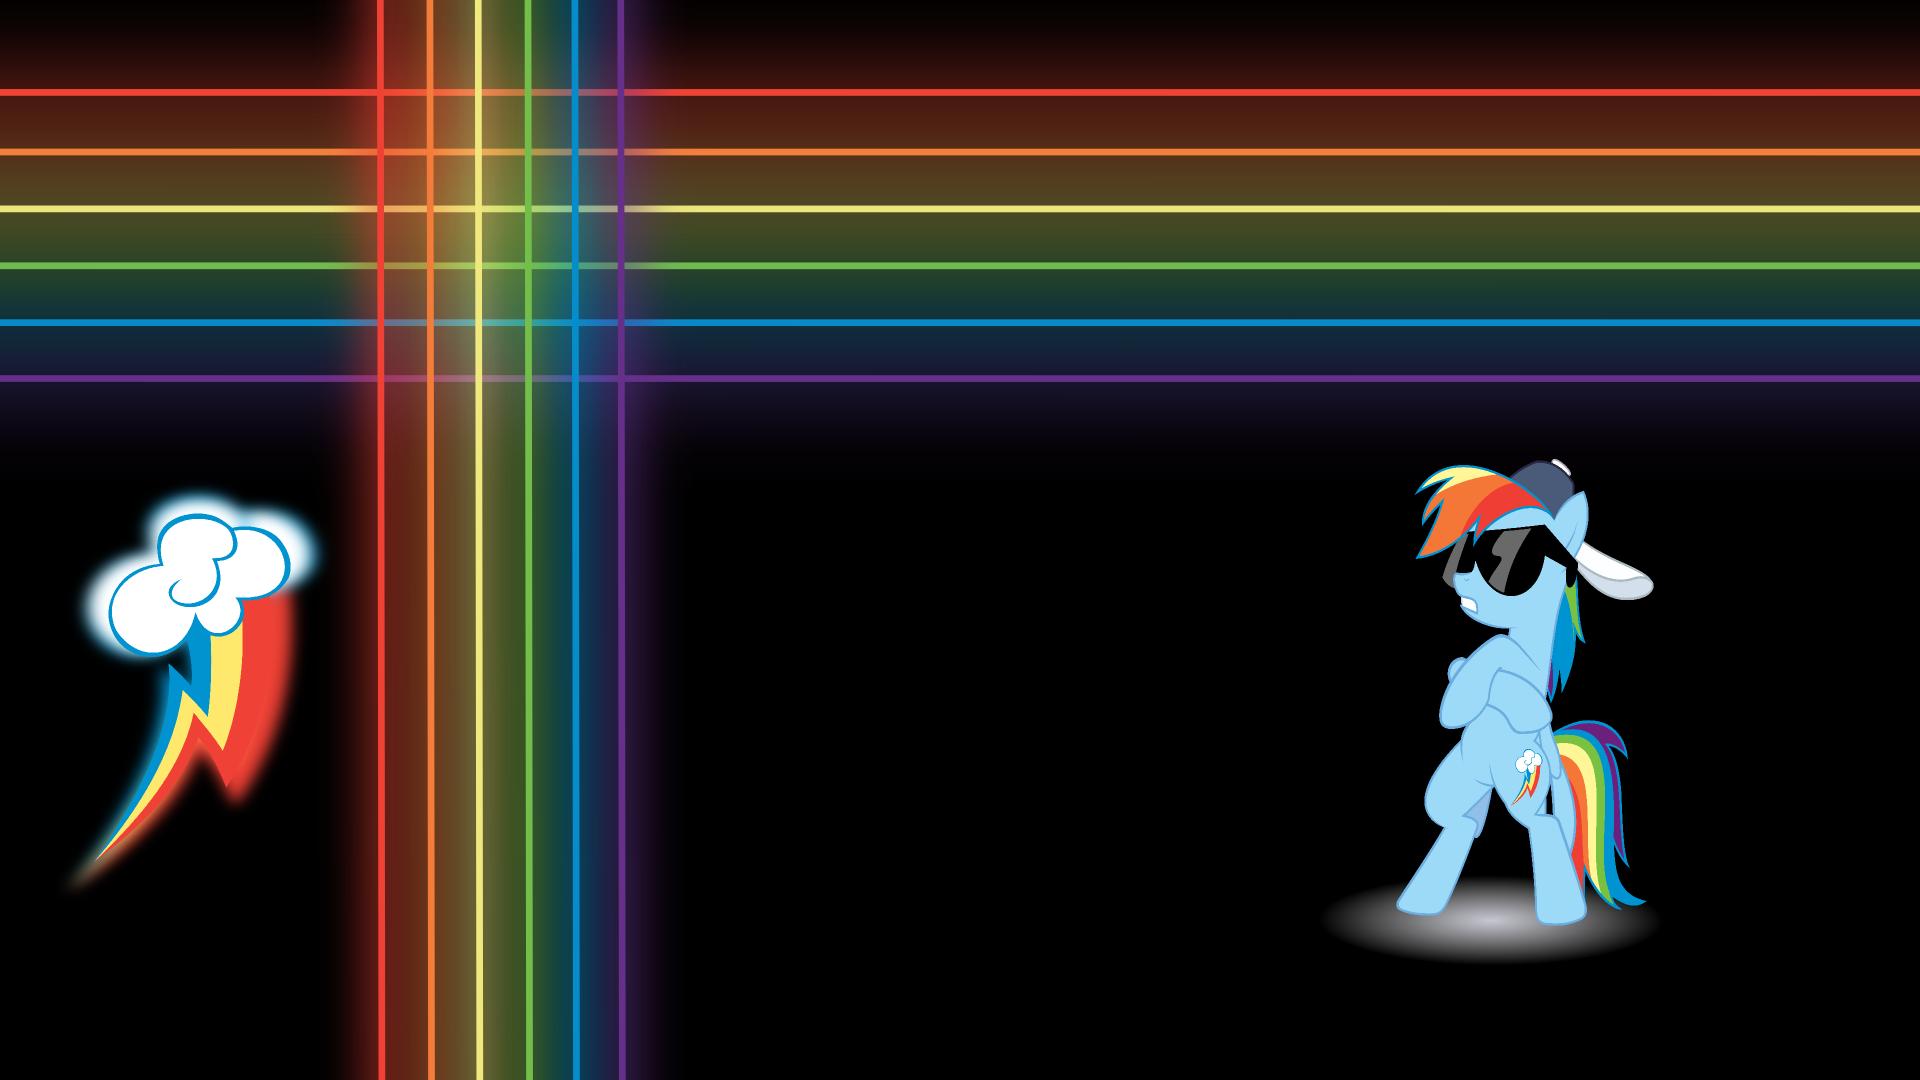 Rainbow Dash Radicalness WP by EROCKERTORRES, Mac3030 and noxwyll